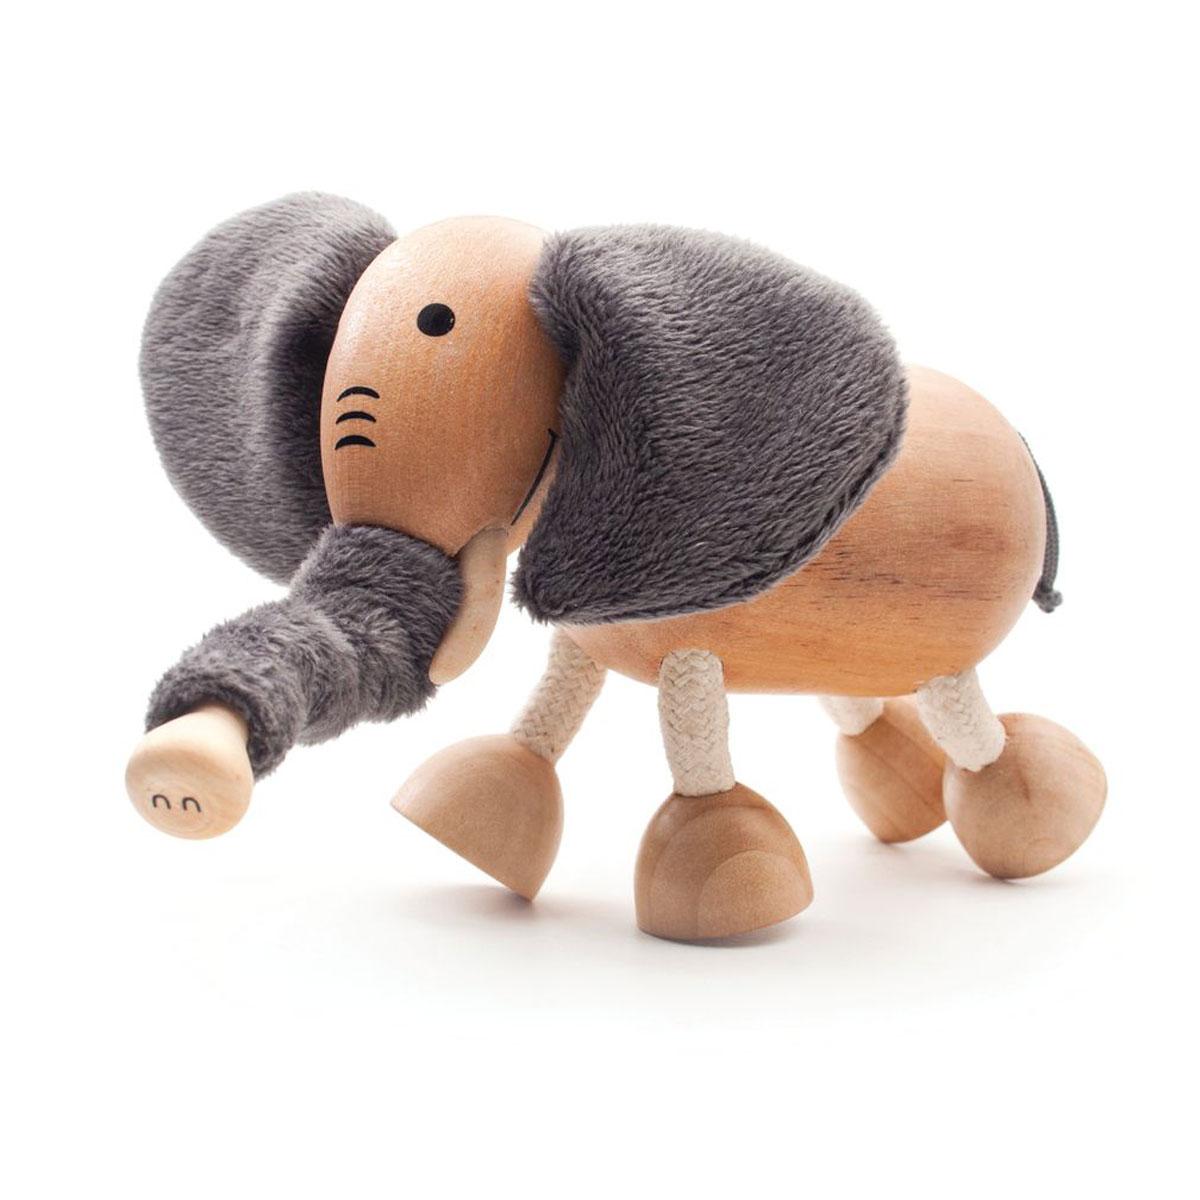 AnaMalz Фигурка деревянная Слоненок фигурки игрушки anamalz anamalz бурый мишка